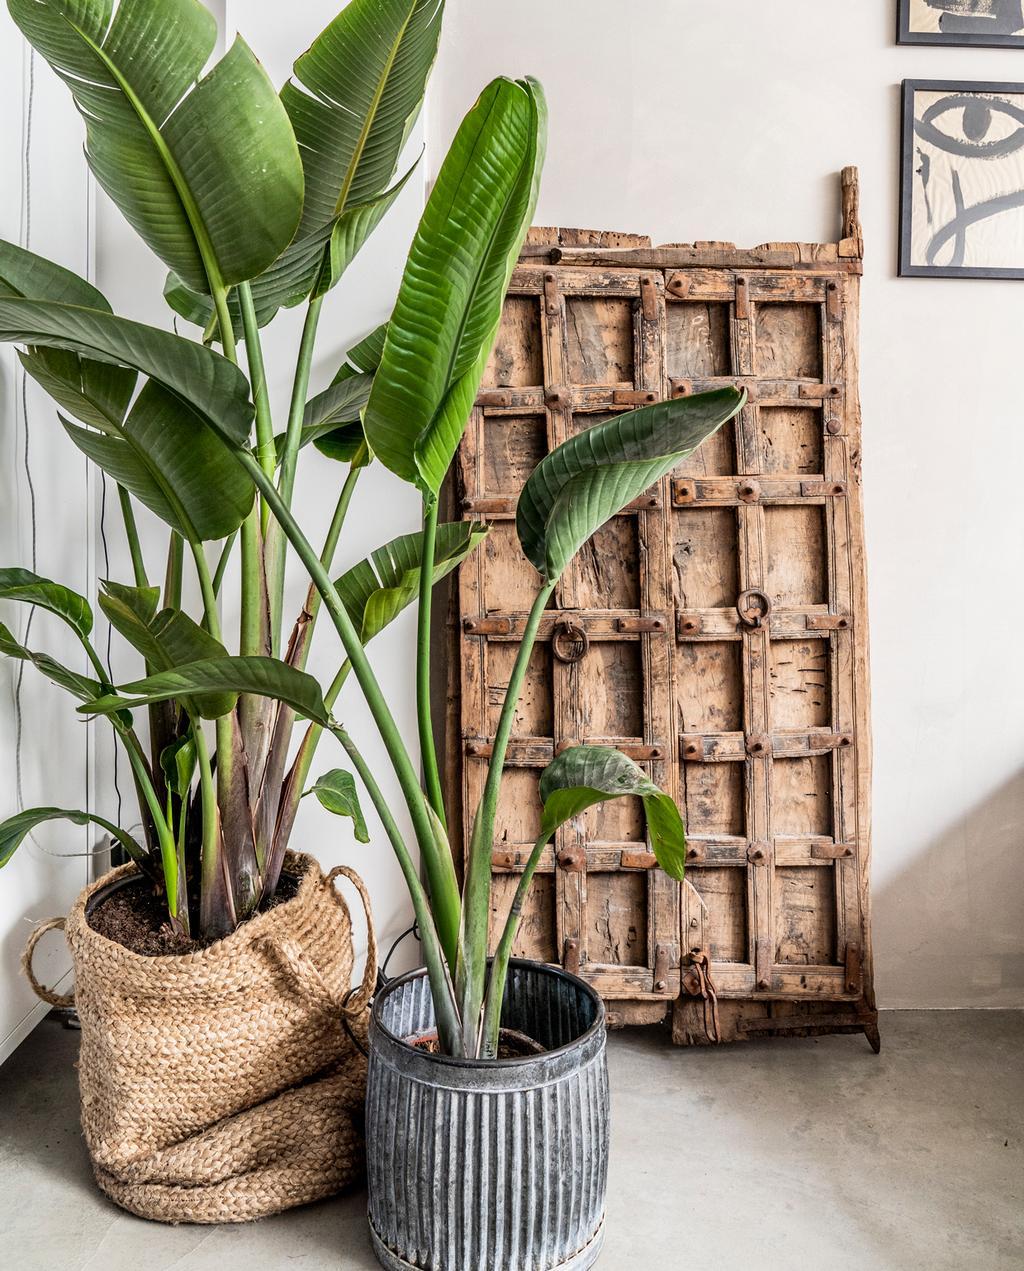 vtwonen binnenkijken special 2019 | plant gedecoreerde wand